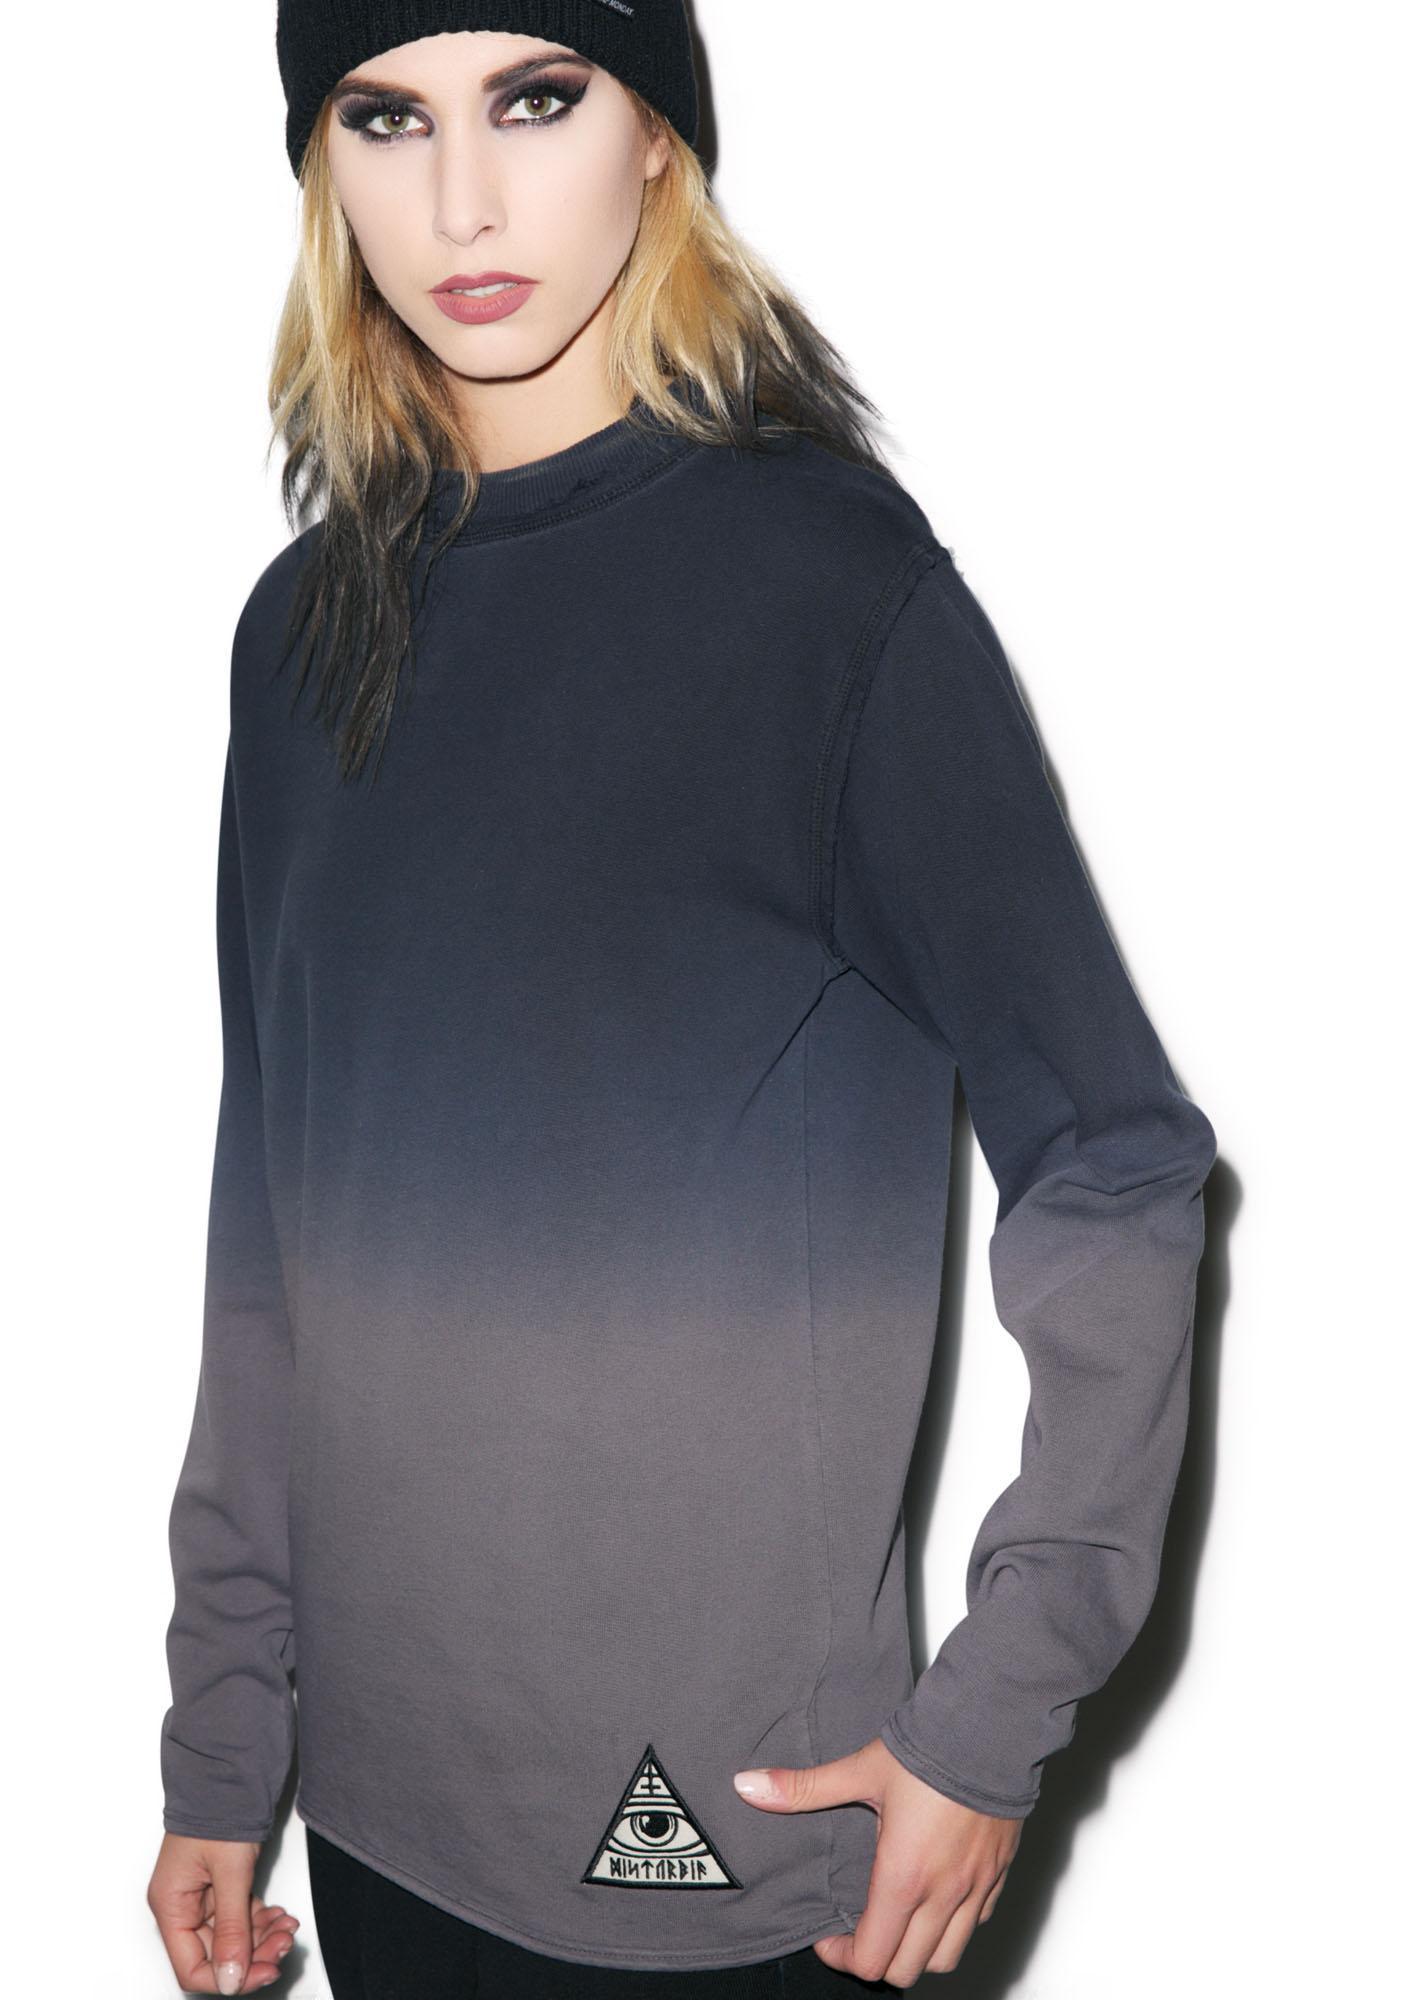 Disturbia Fade to Black Sweatshirt